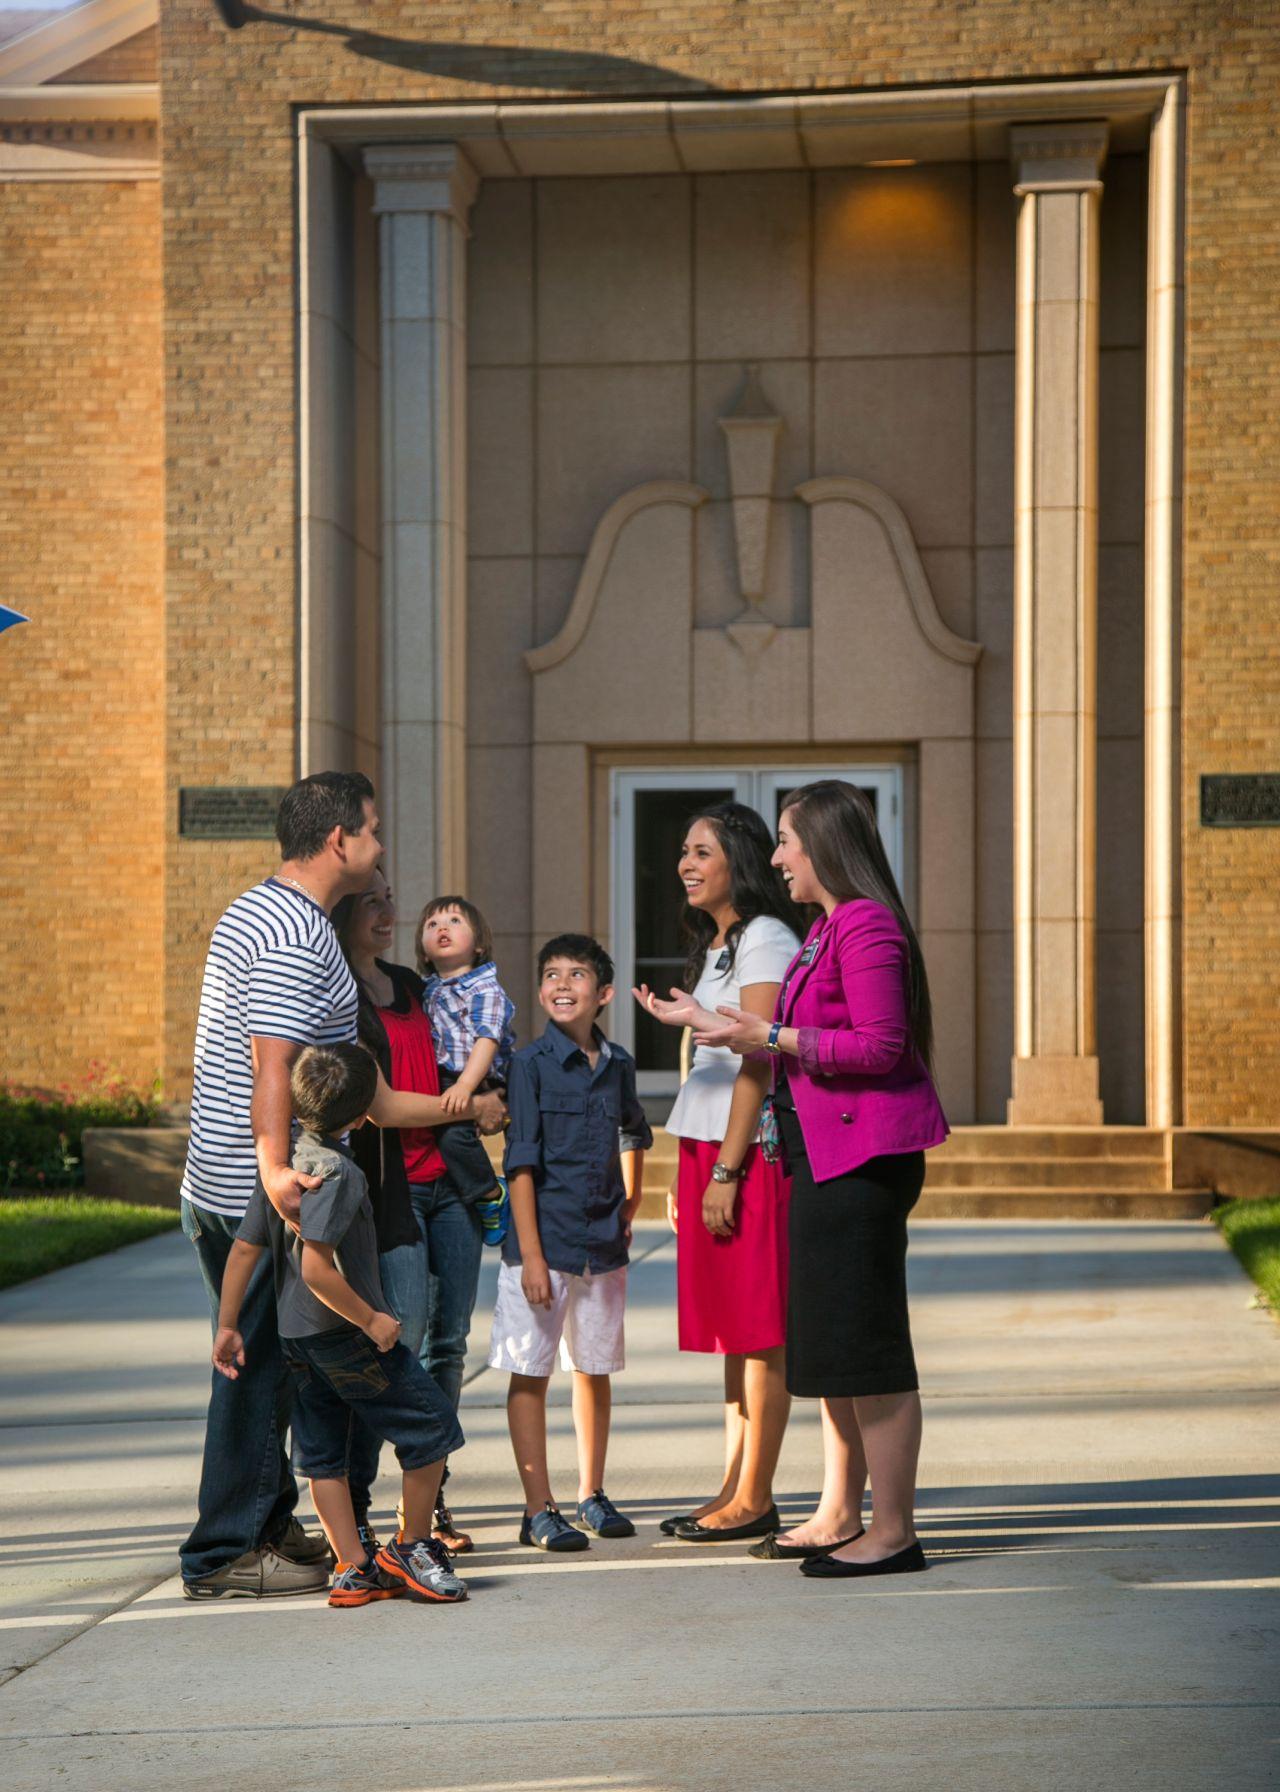 una familia visita una capilla, guida por misioneras